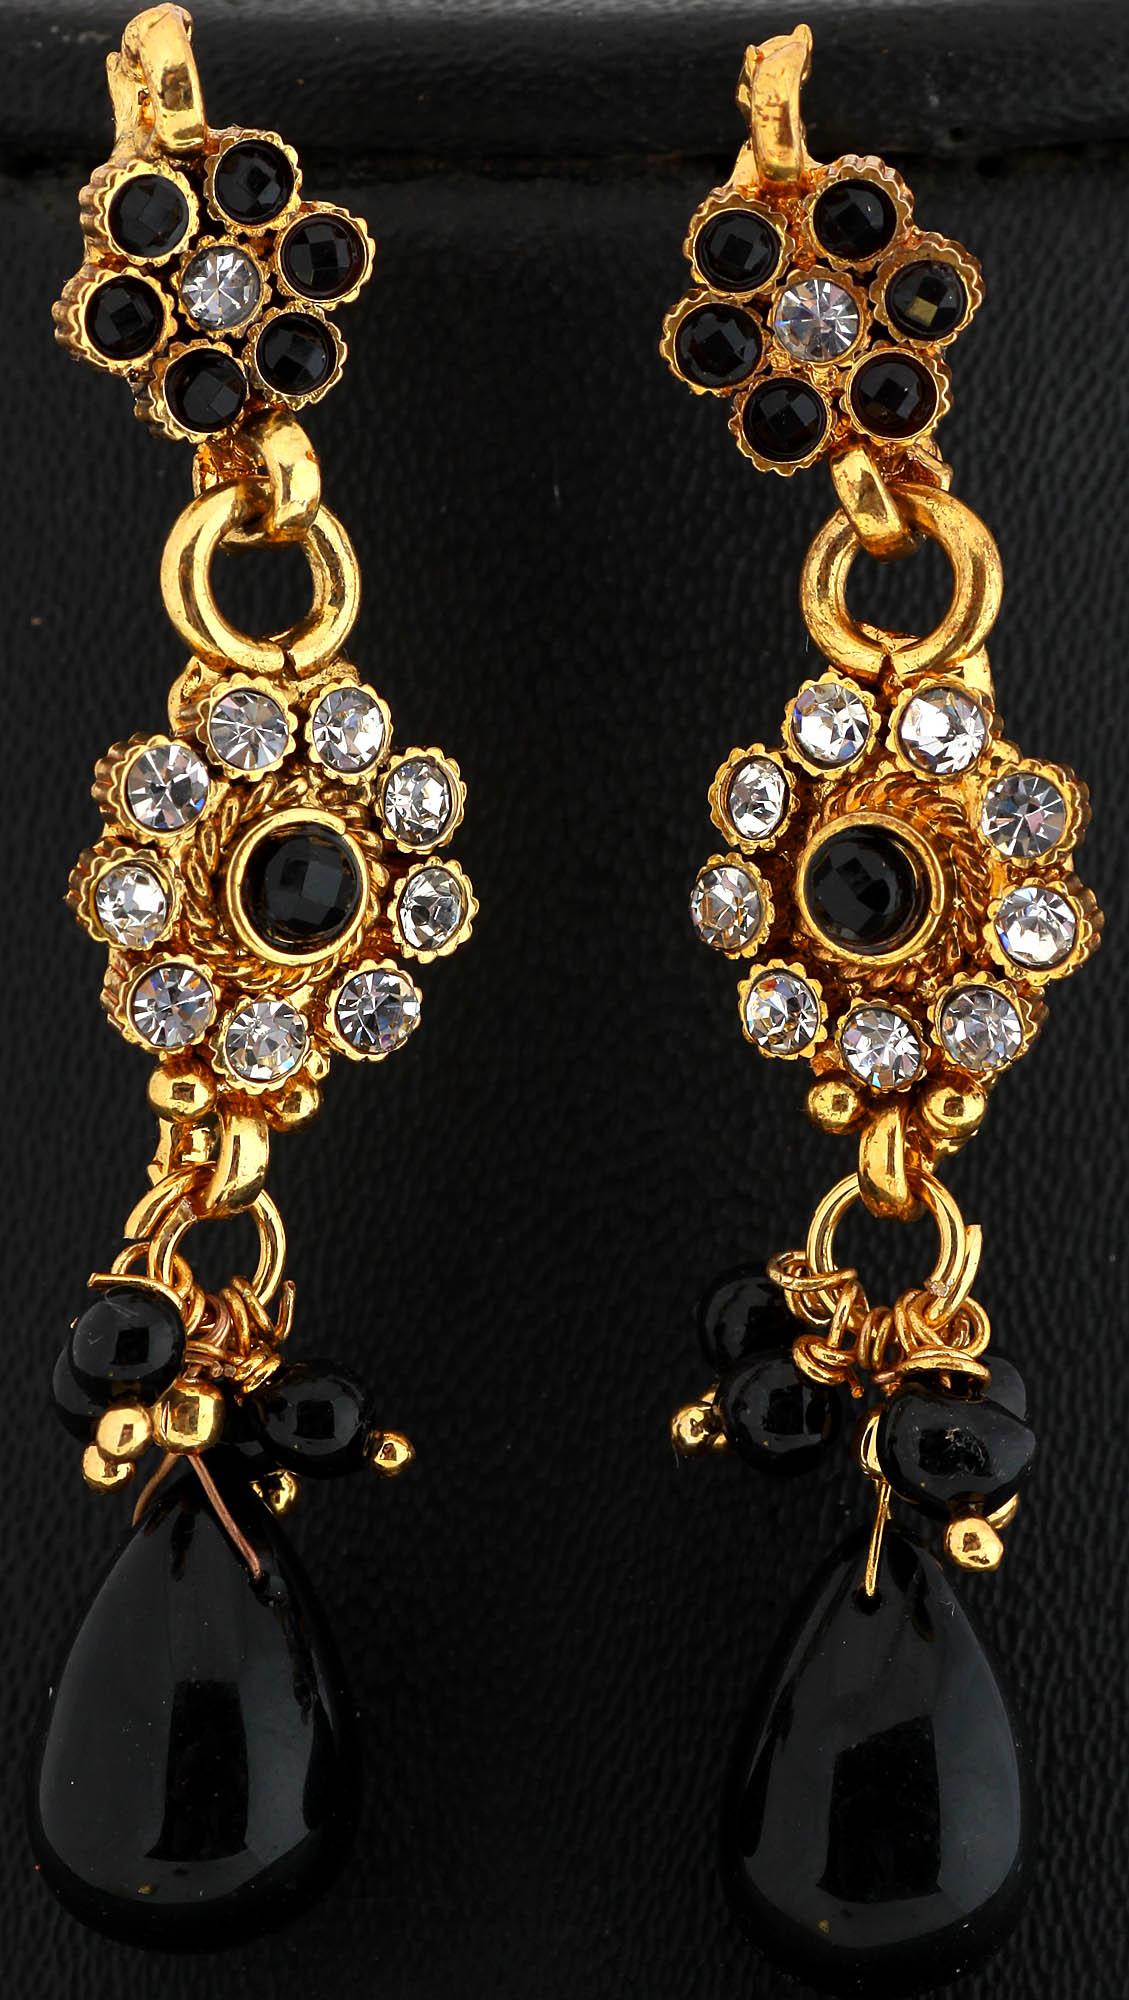 38 Best Onyx Jewelry images | Black onyx, Navajo, Navajo ...